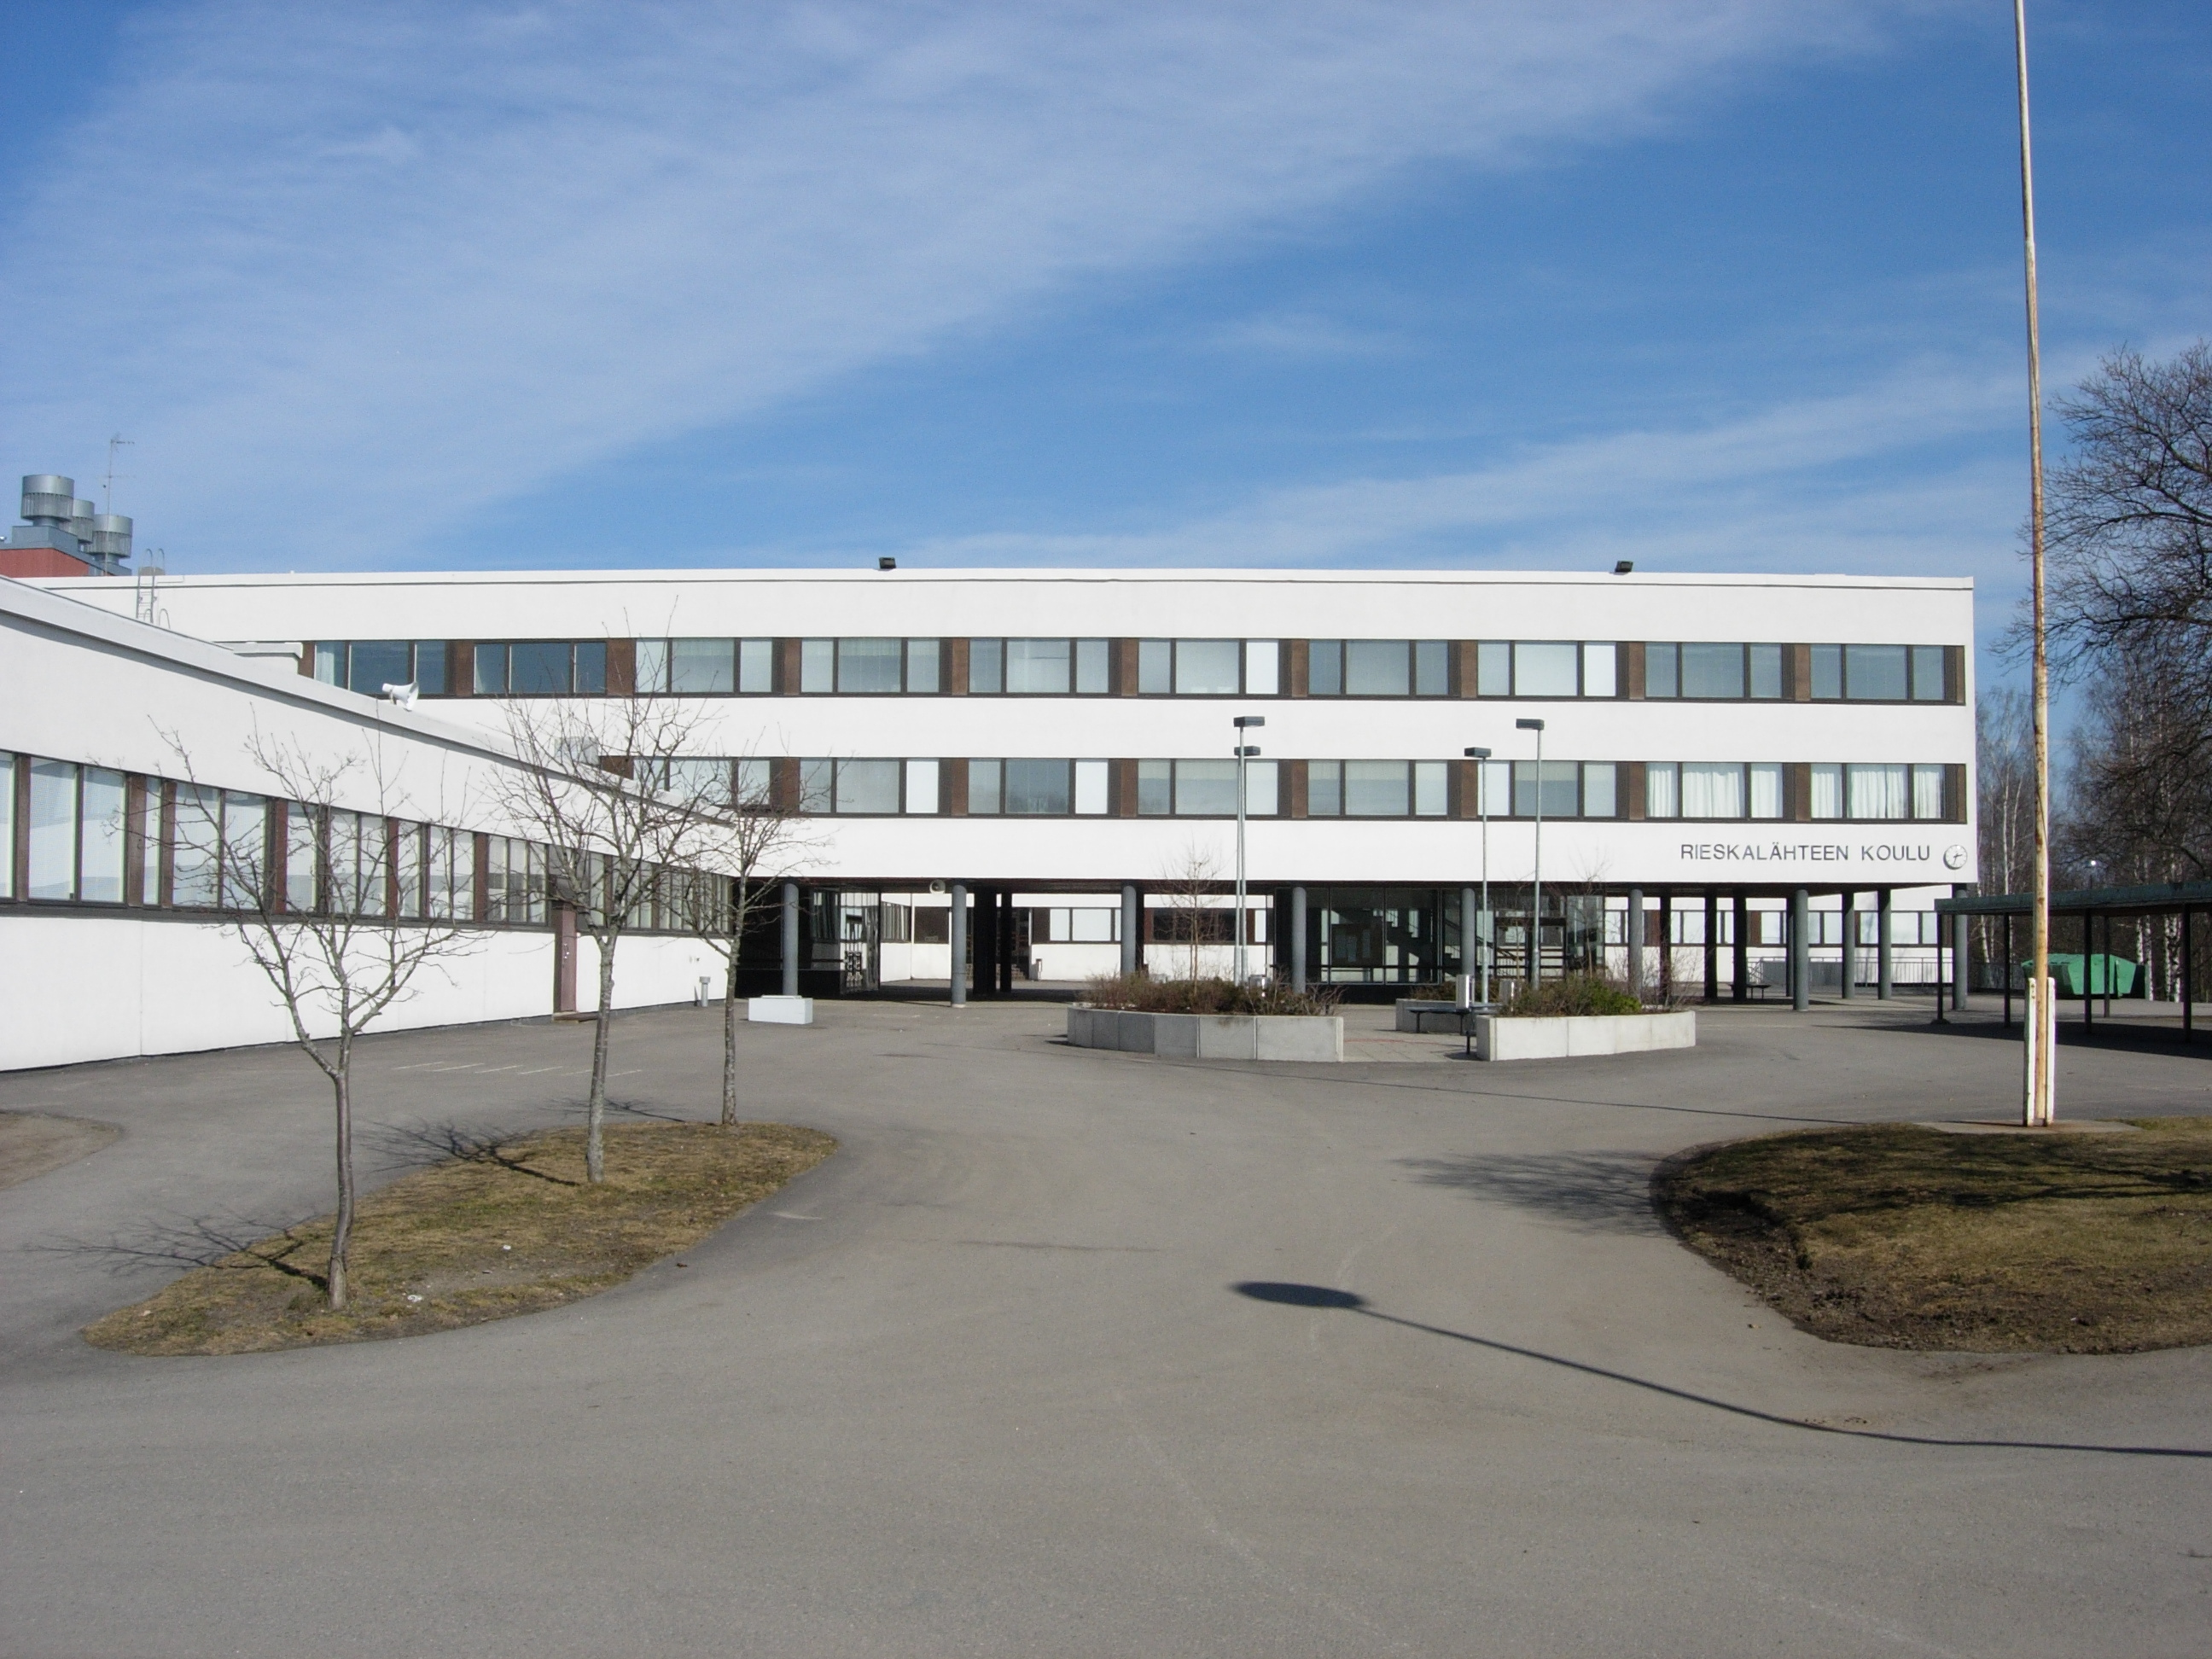 Vuorelan Koulu